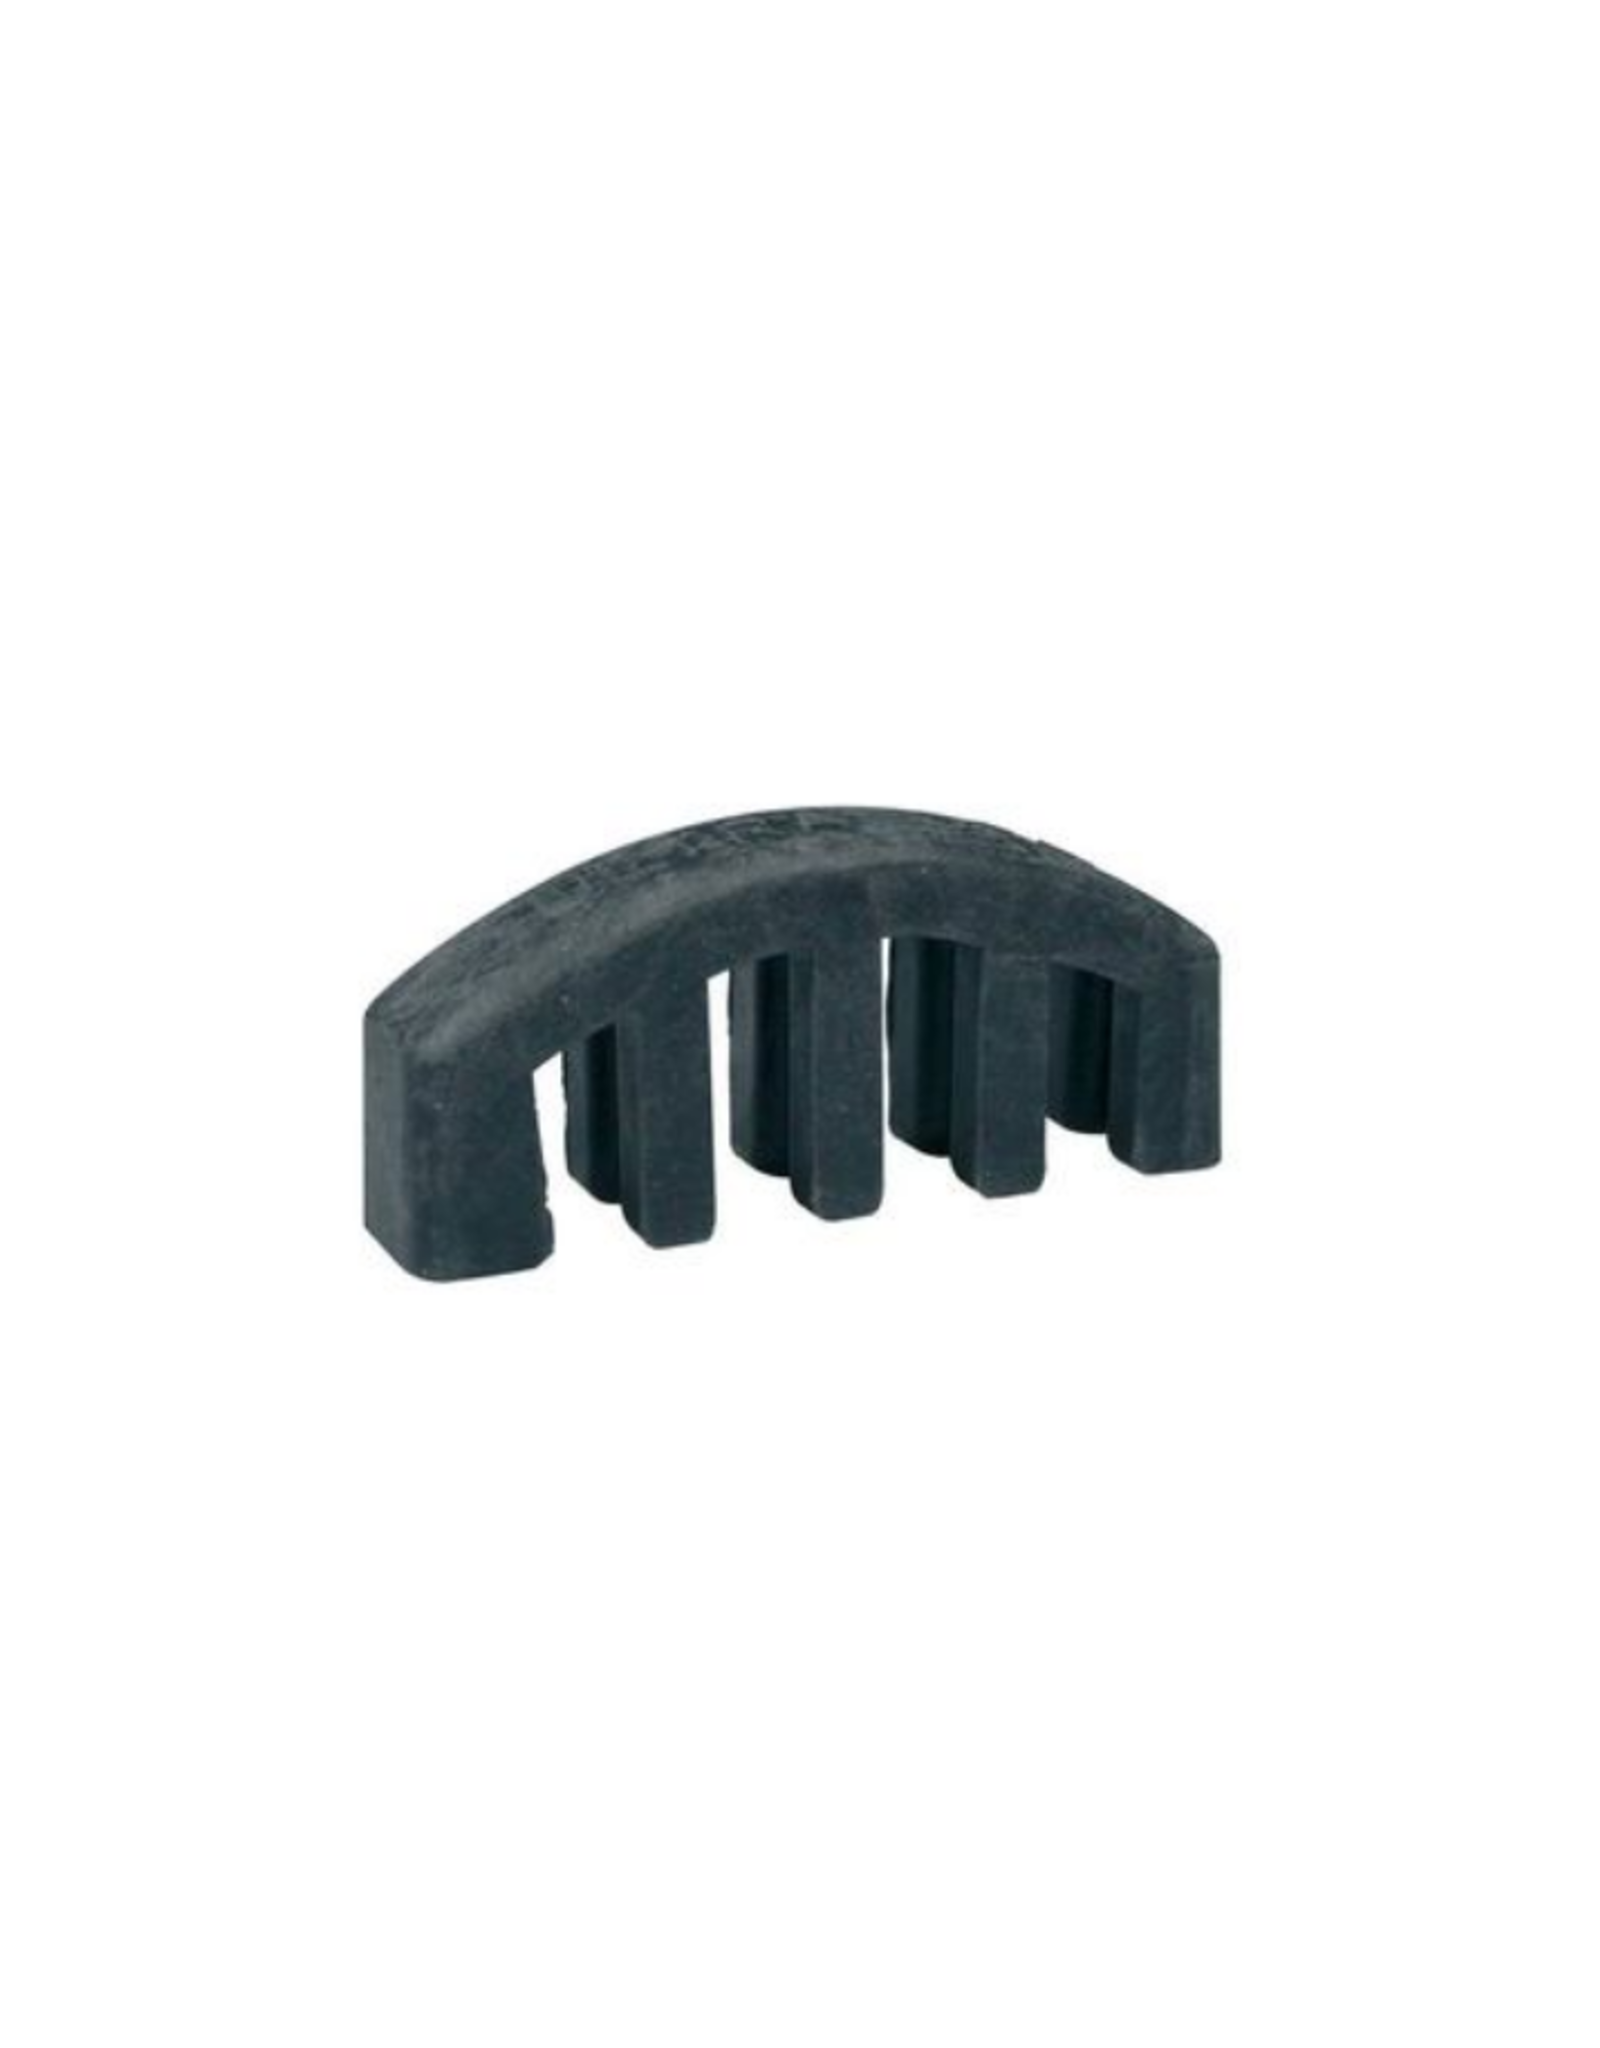 ELS altviool demper, ultra model, high density rubber, made in USA